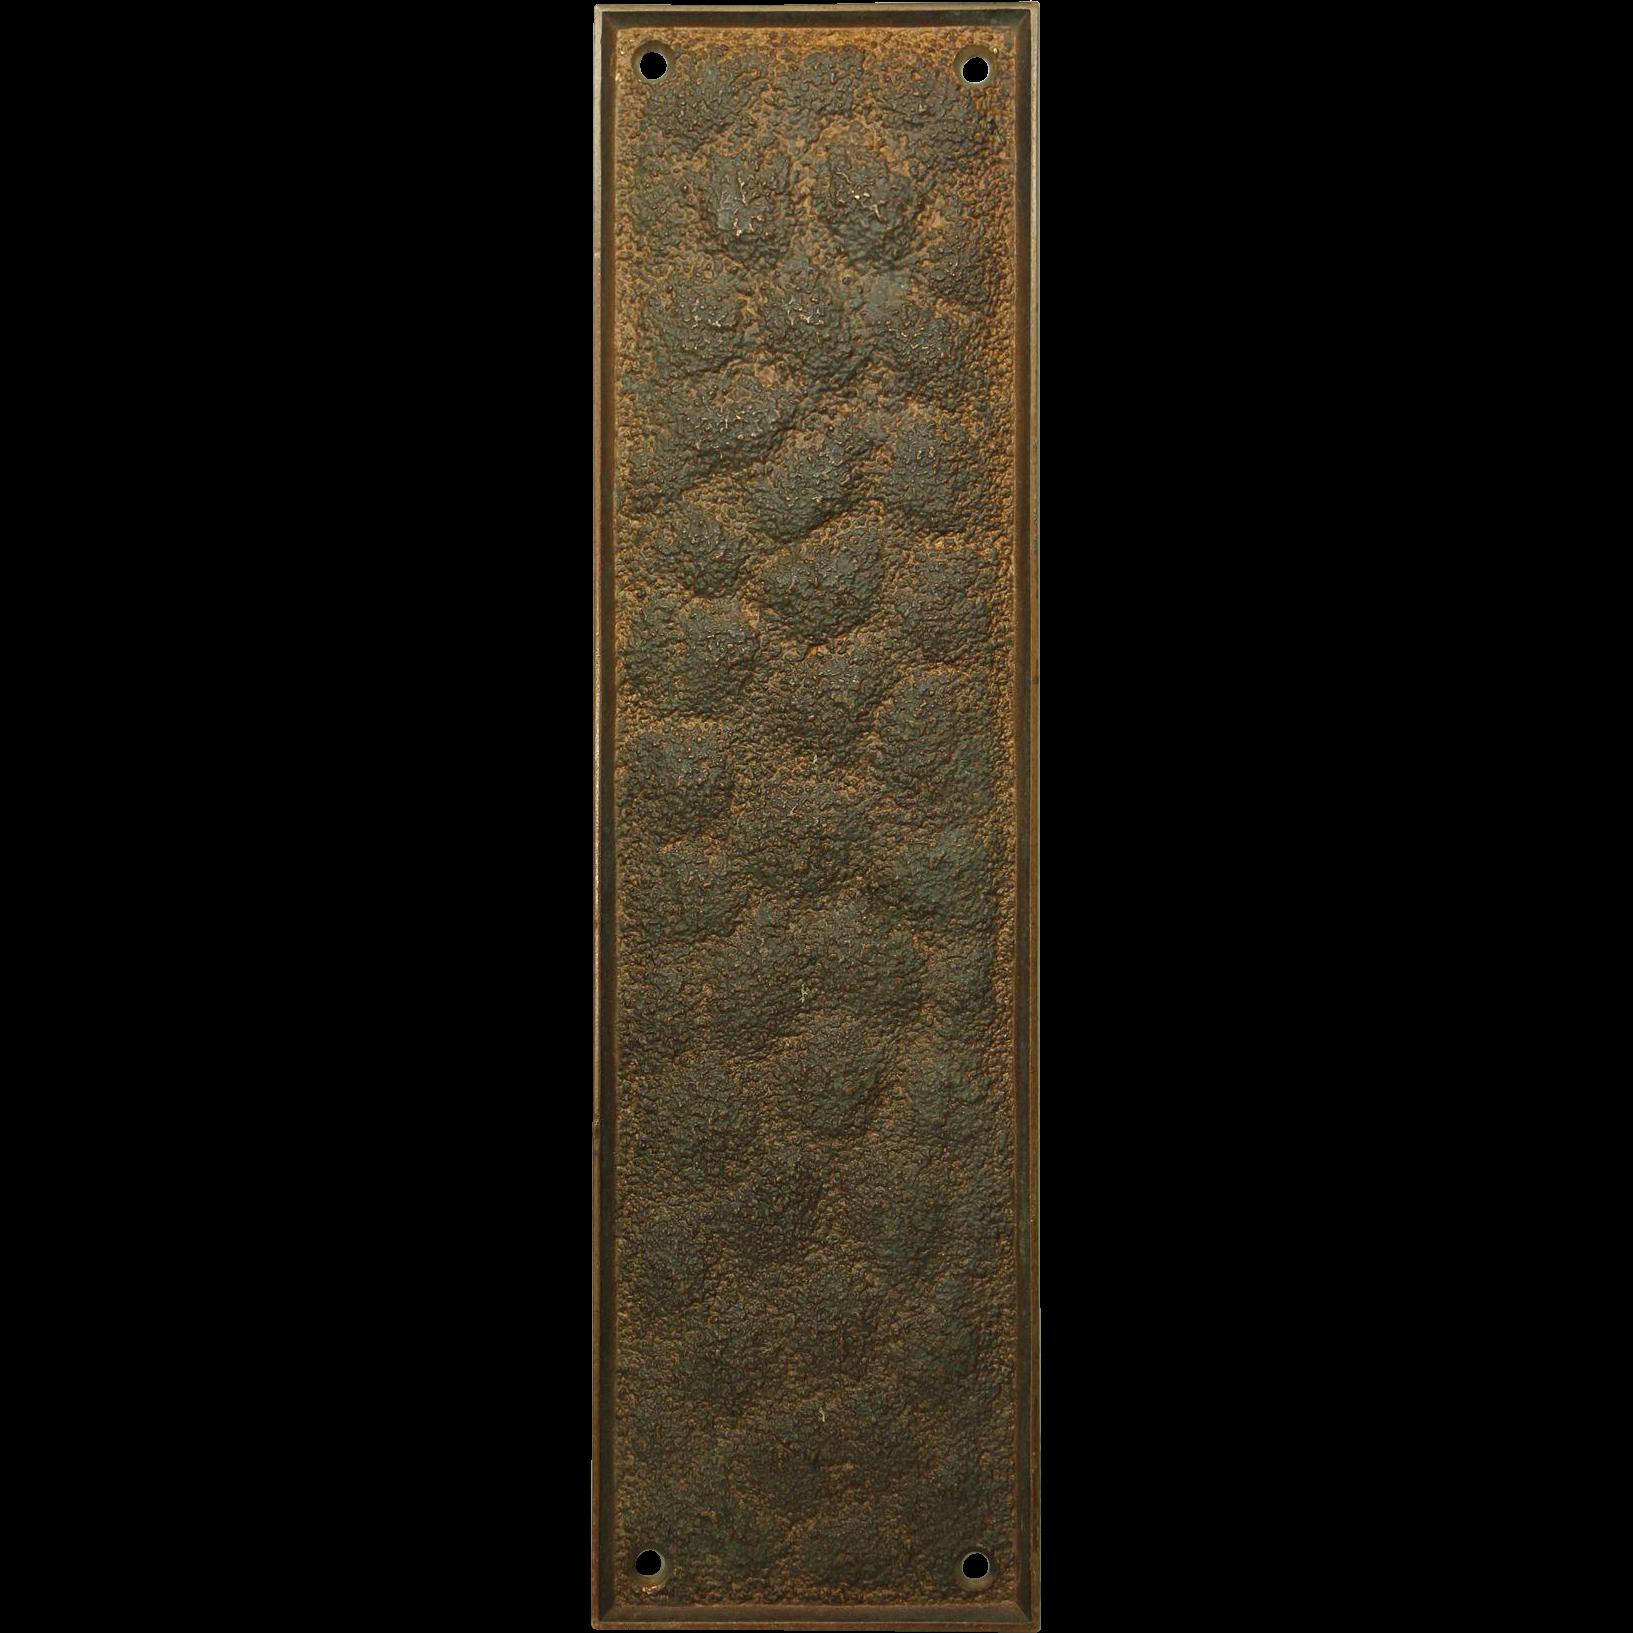 Textured Russwin bronze push plate